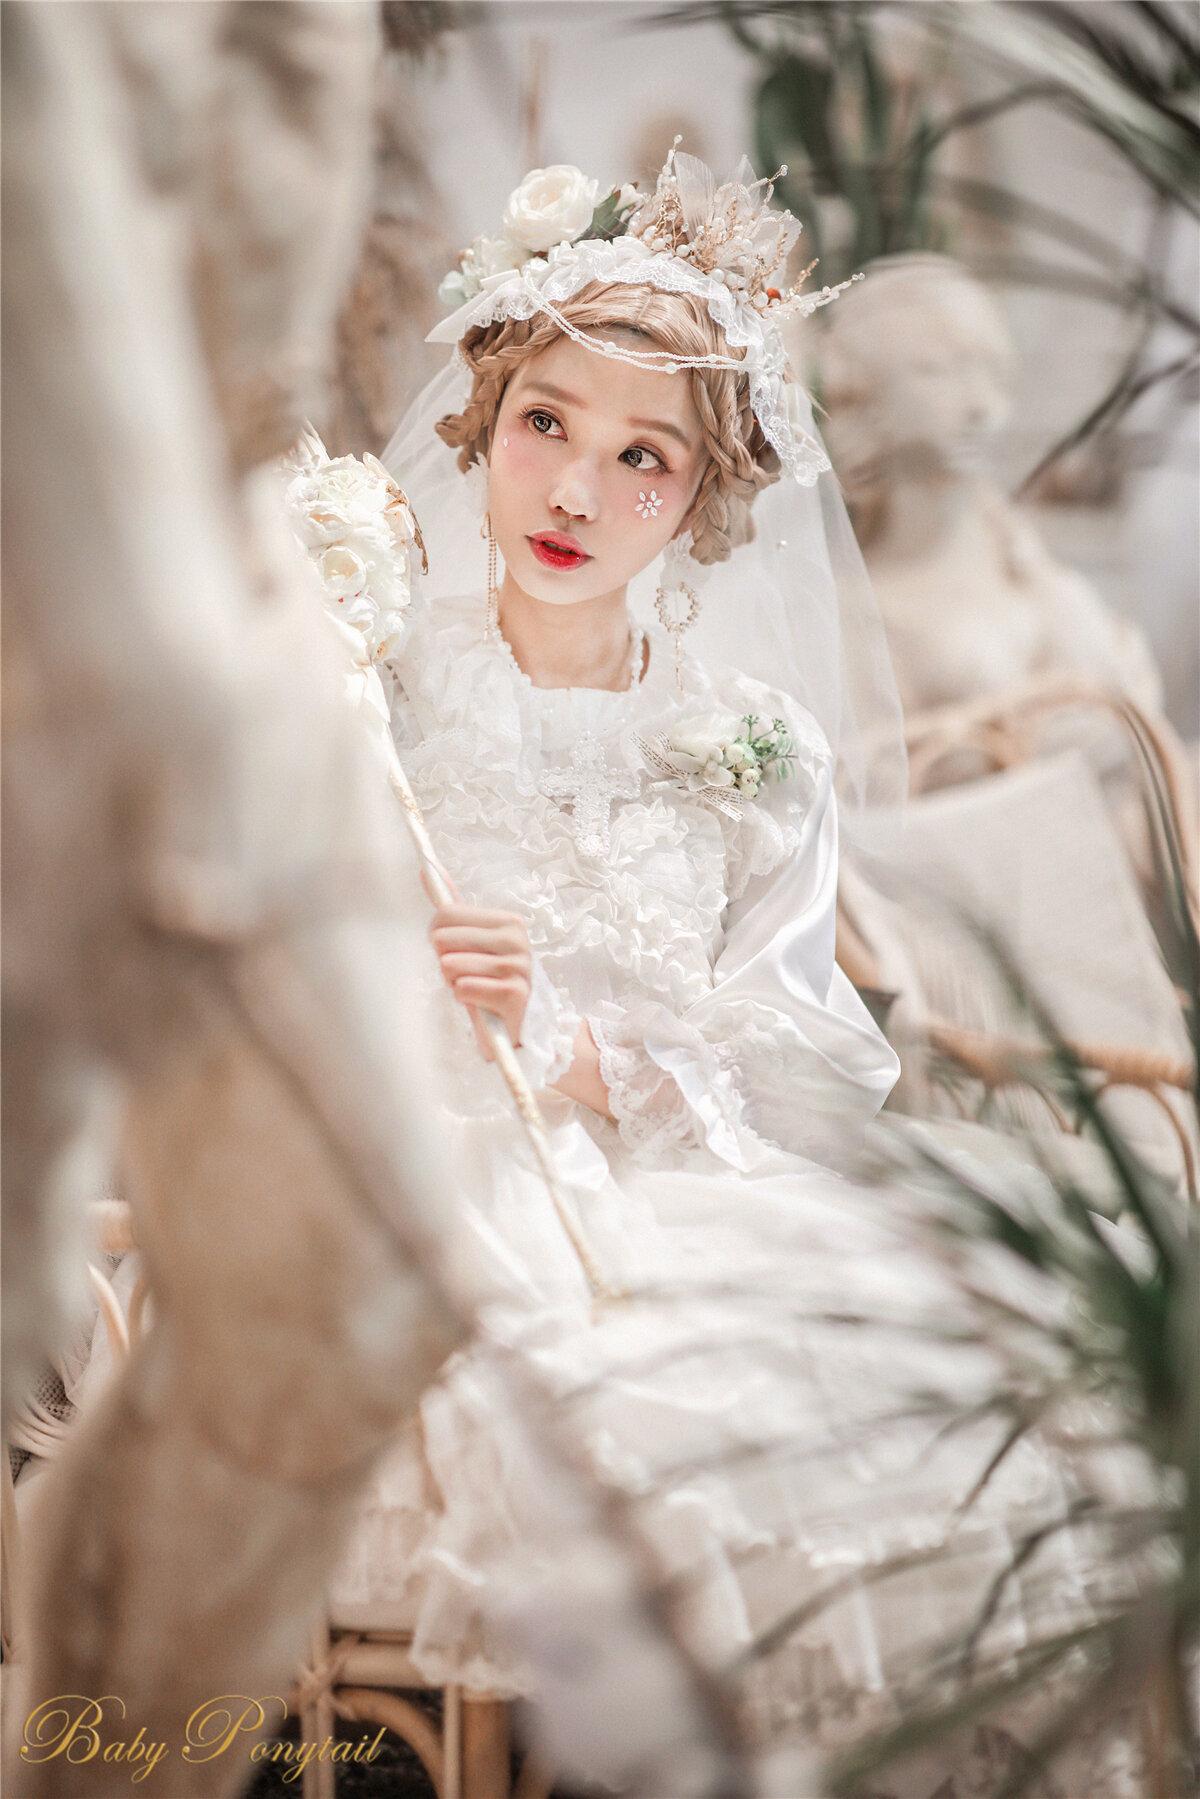 Babyponytail_Heavenly Teardrops_Model photo_JSK white_kaka_21.jpg